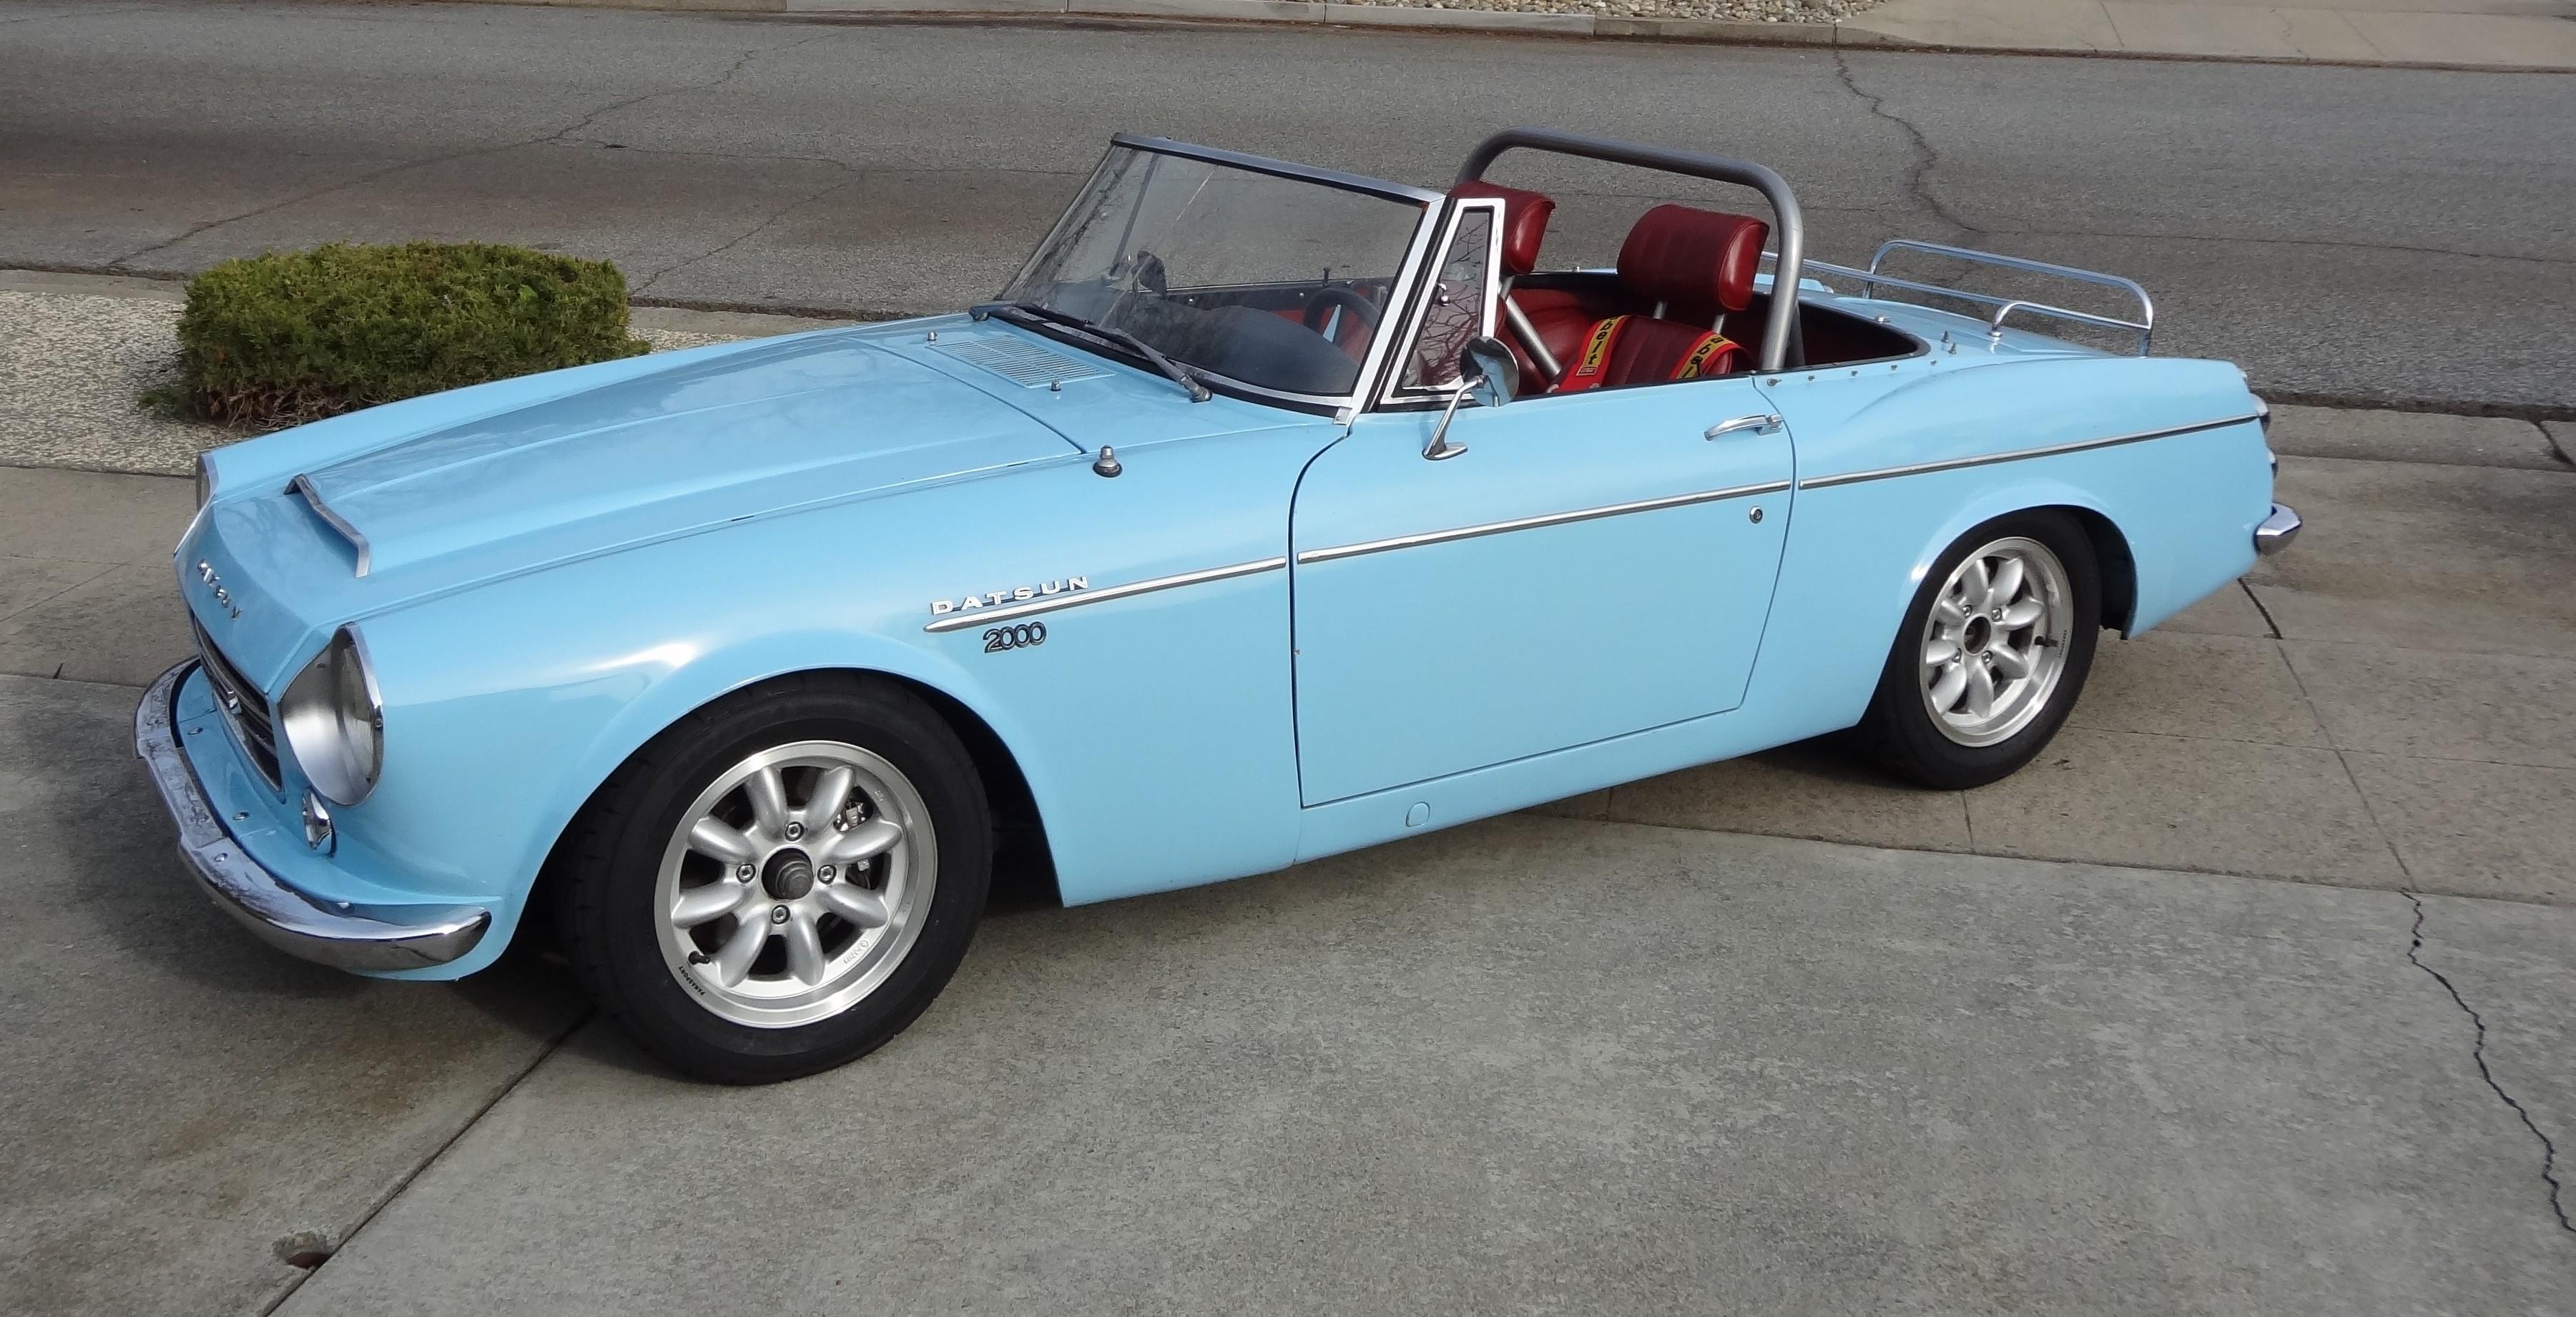 front & rear suspenion eplacemenn & modifcation - Page 2 - Datsun ...